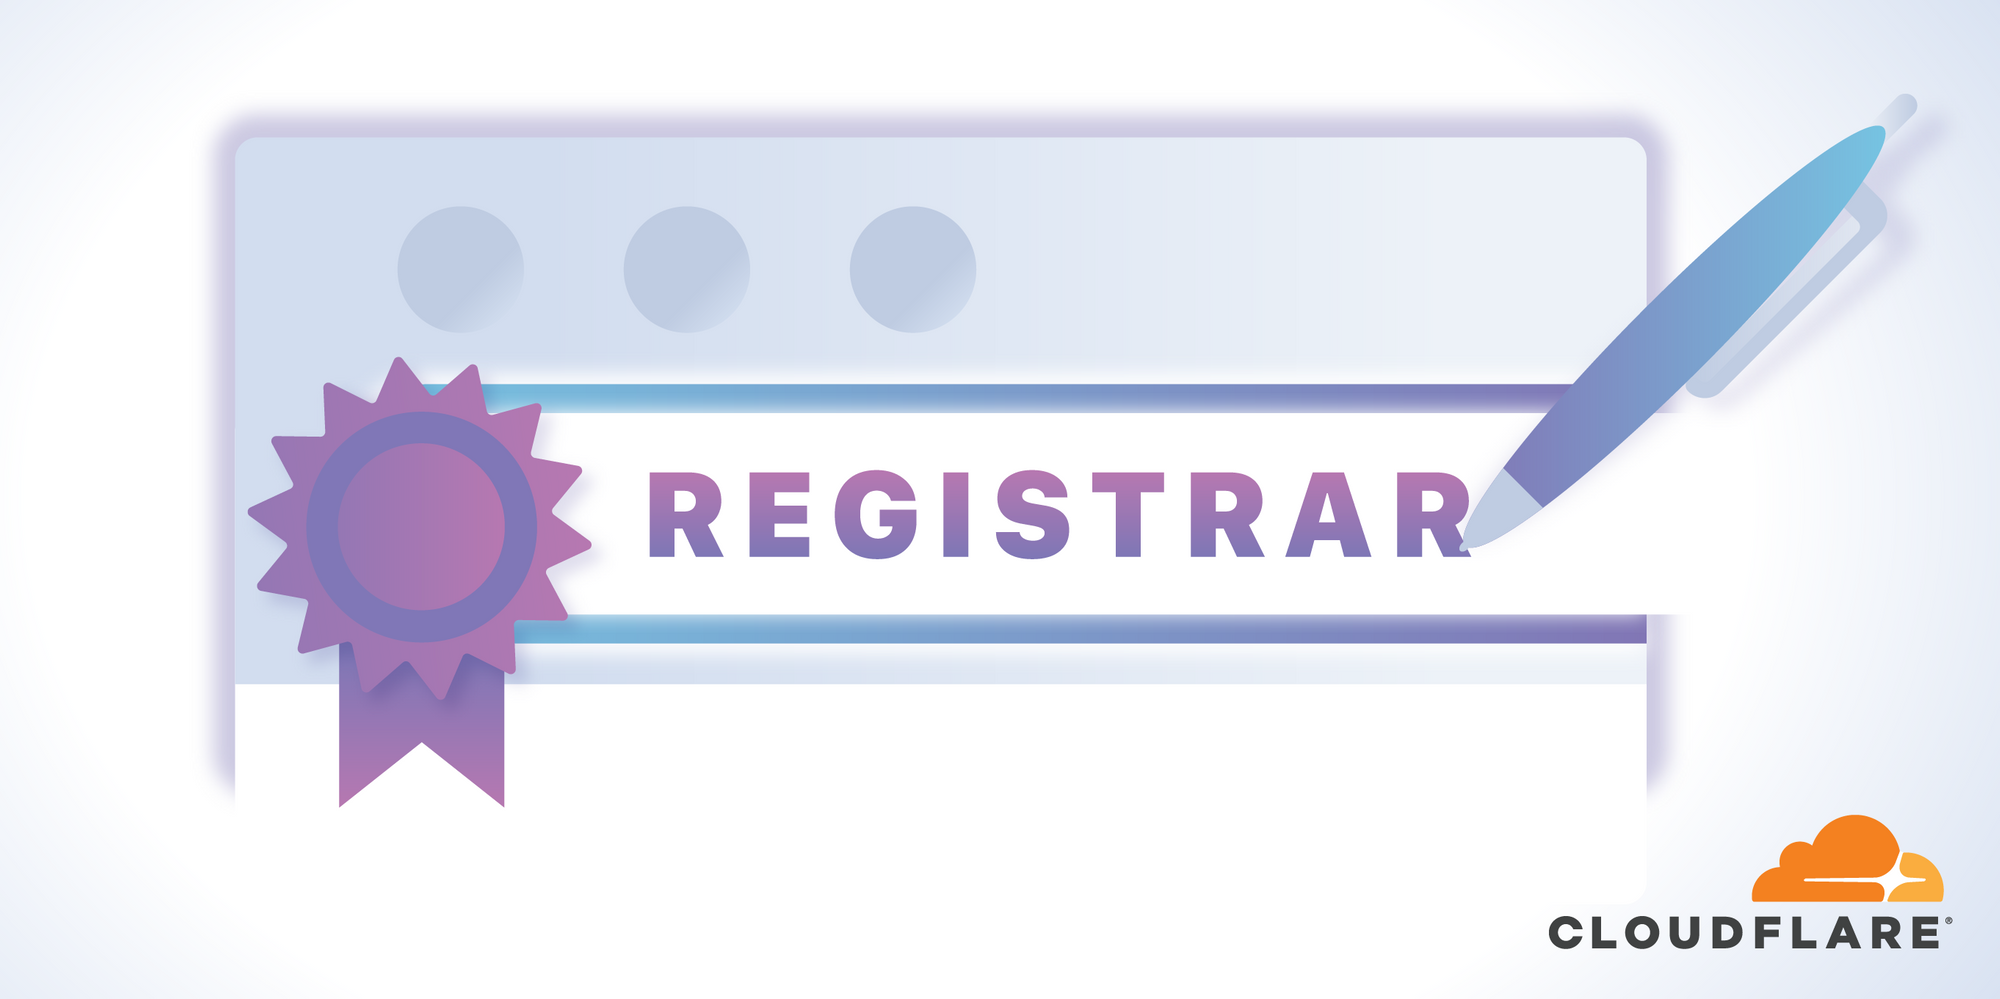 Domaines Cloudflare Lancement RegistrarL'enregistrement Cloudflare Lancement De De nOvN0ym8w